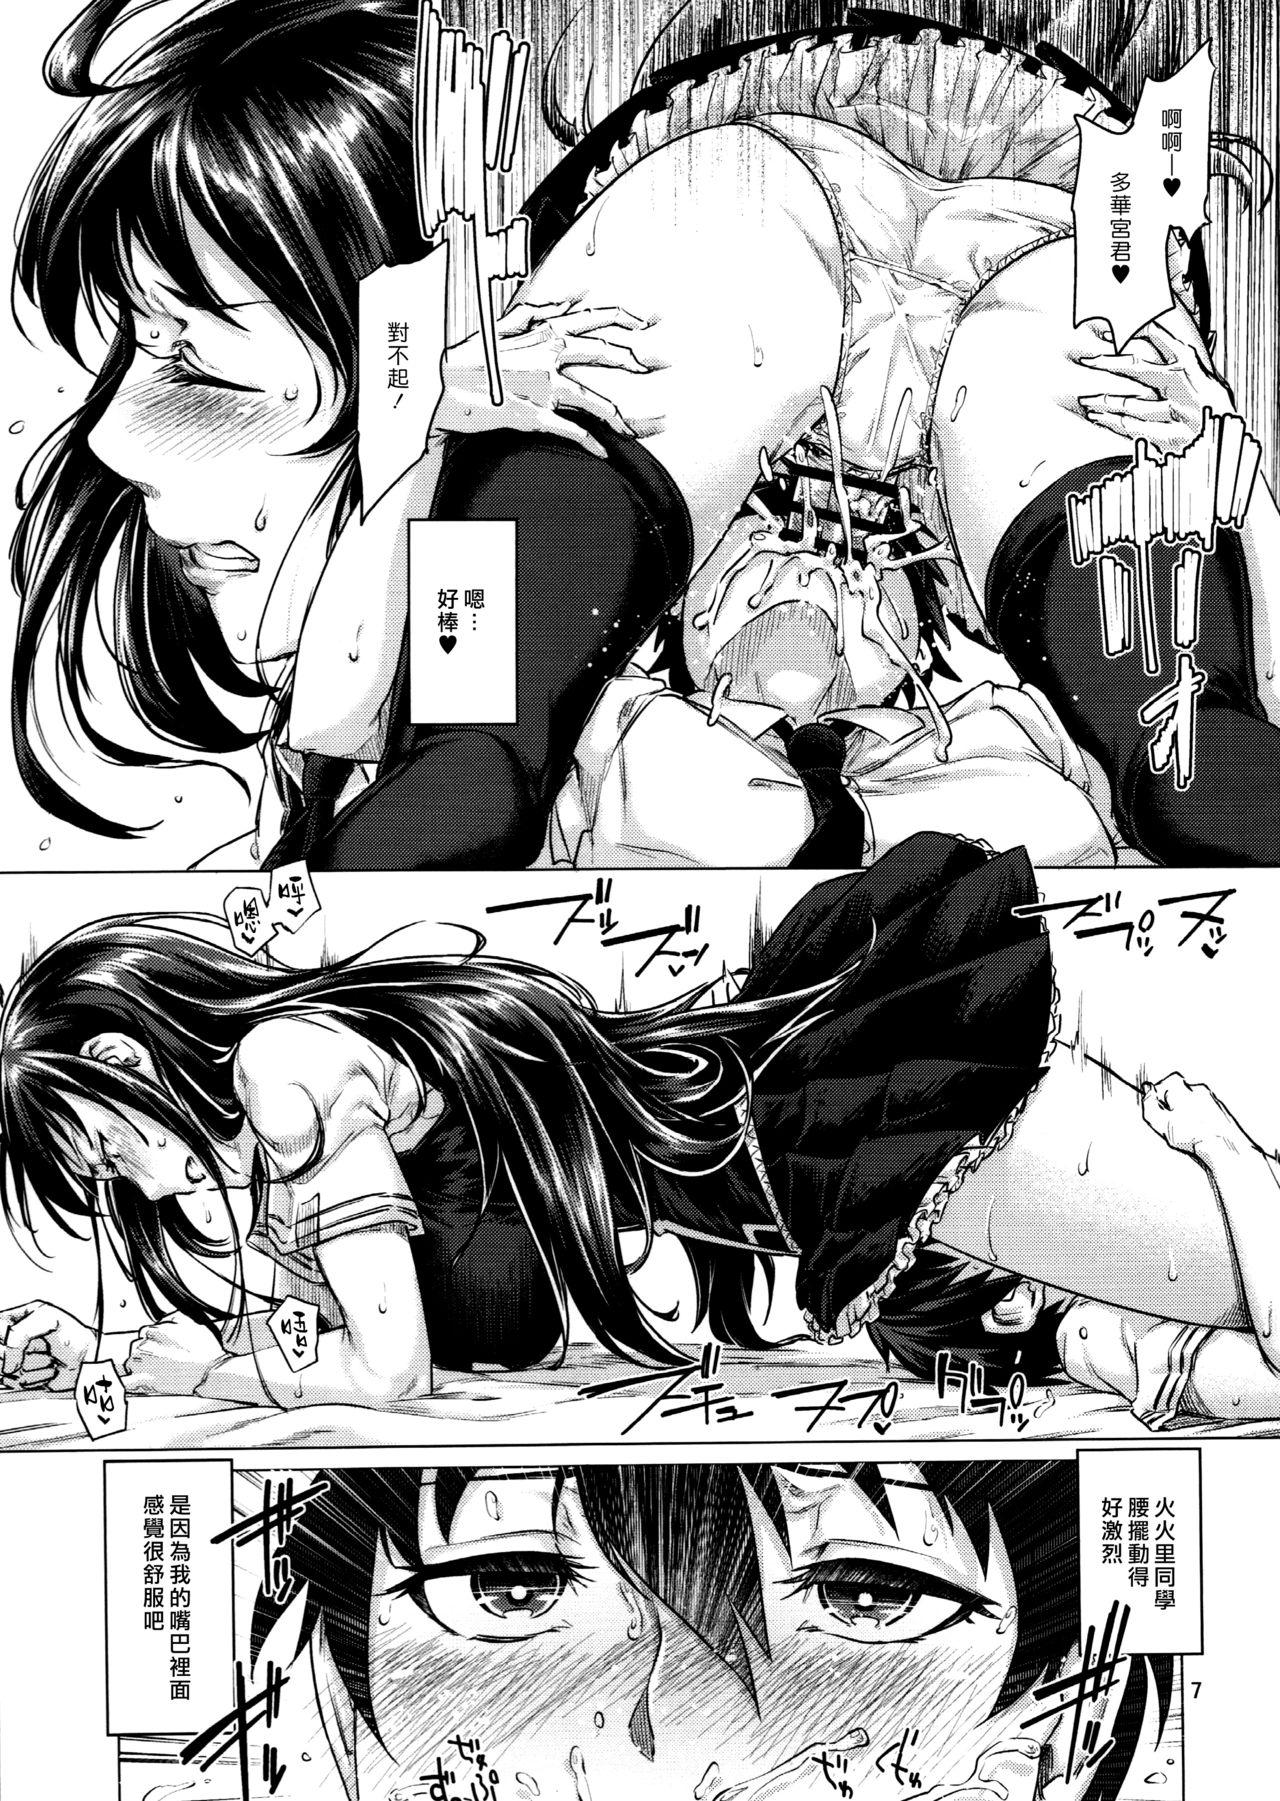 Honoo no Majo ni Oshiri Ijirareru Hon | 被炎之魔女玩弄屁股的本本 5